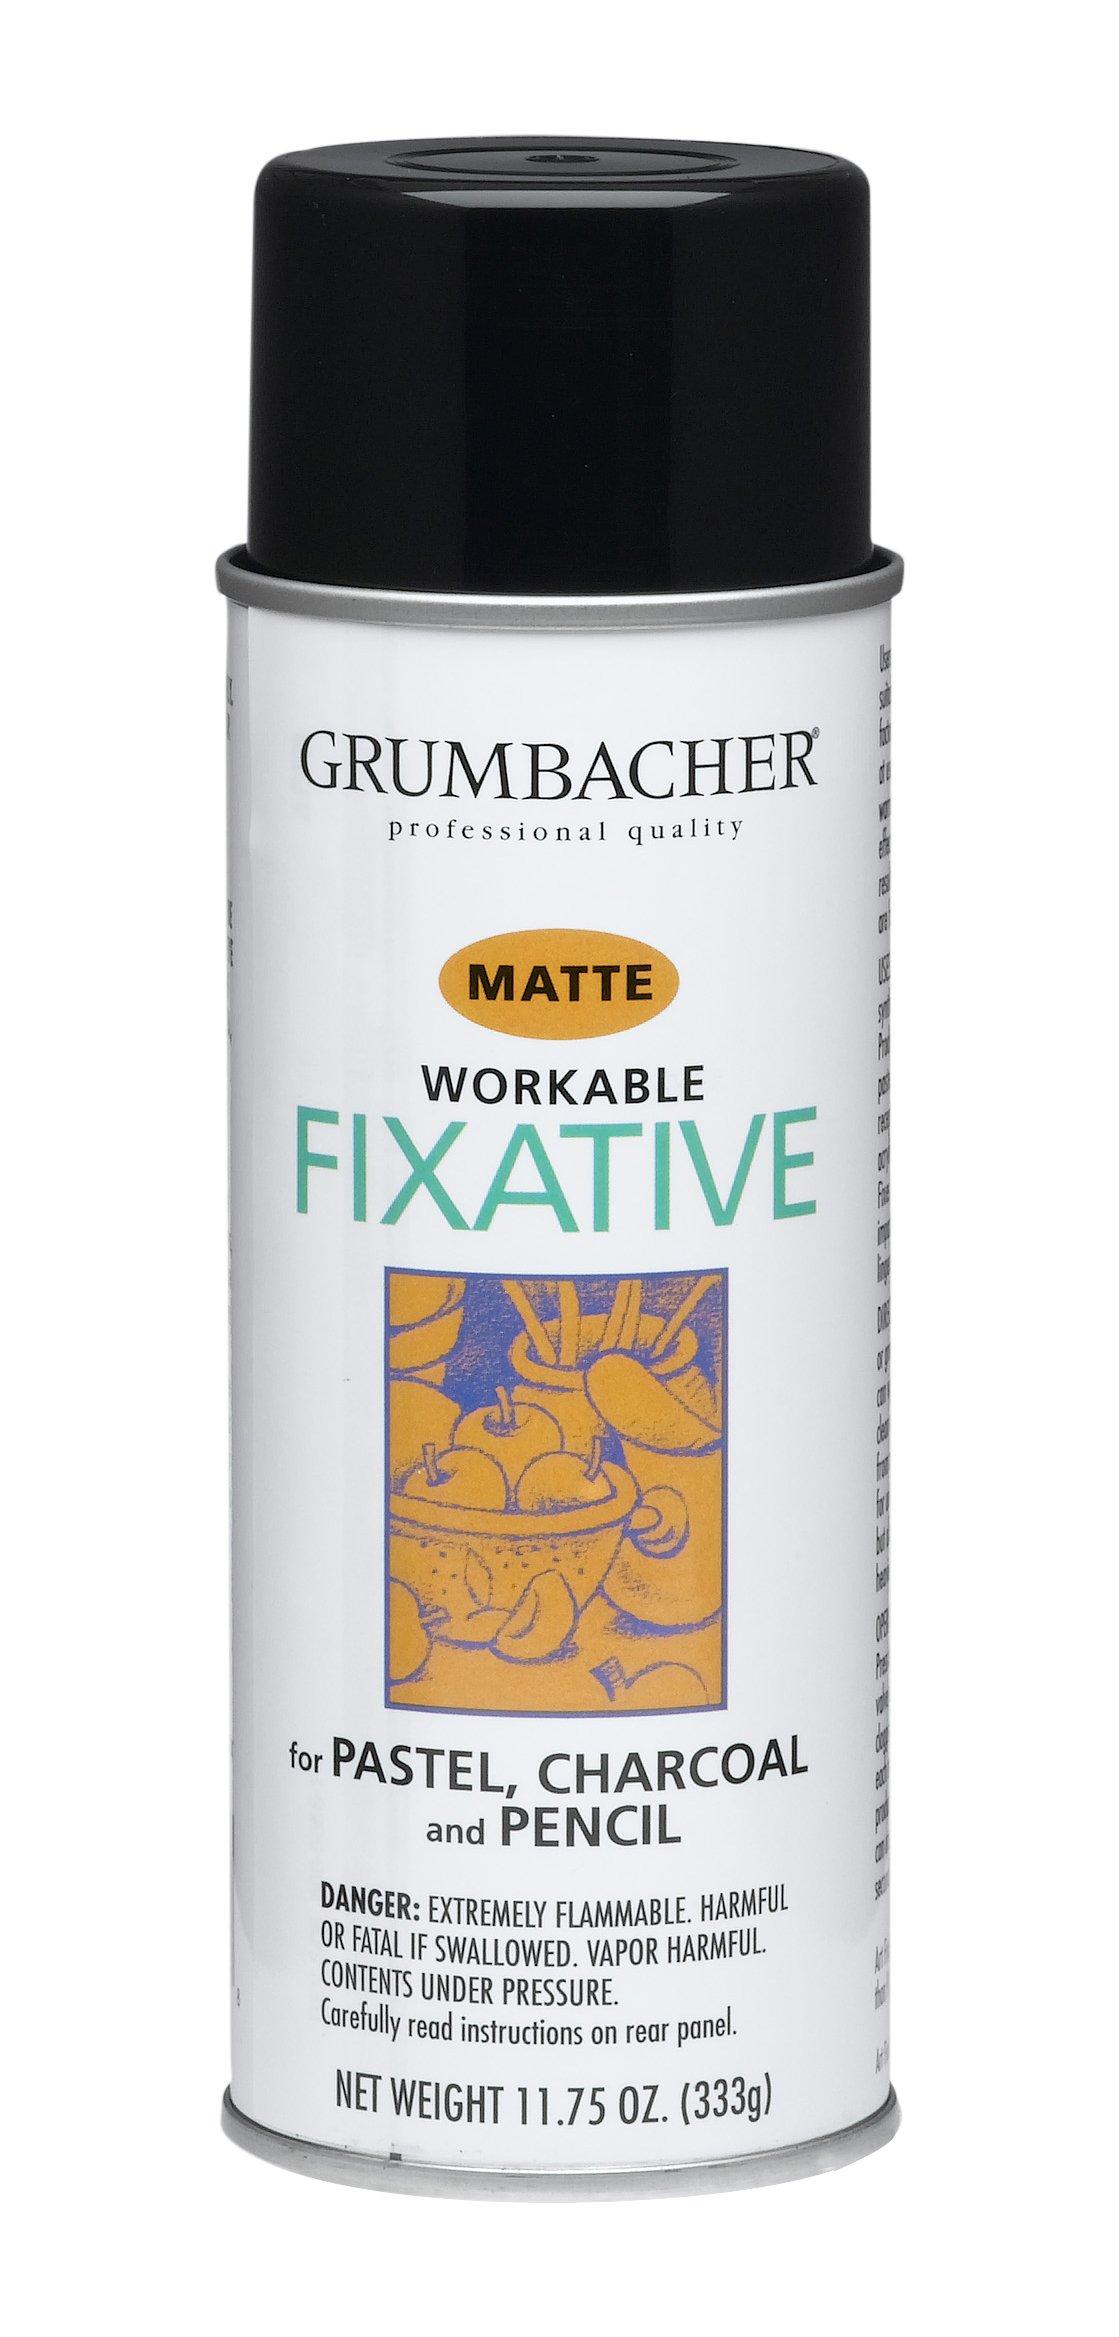 GRUMBACHER 546 11-3/4-Ounce Workable Fixative Spray, 11-3/4-Ounce Can by GRUMBACHER